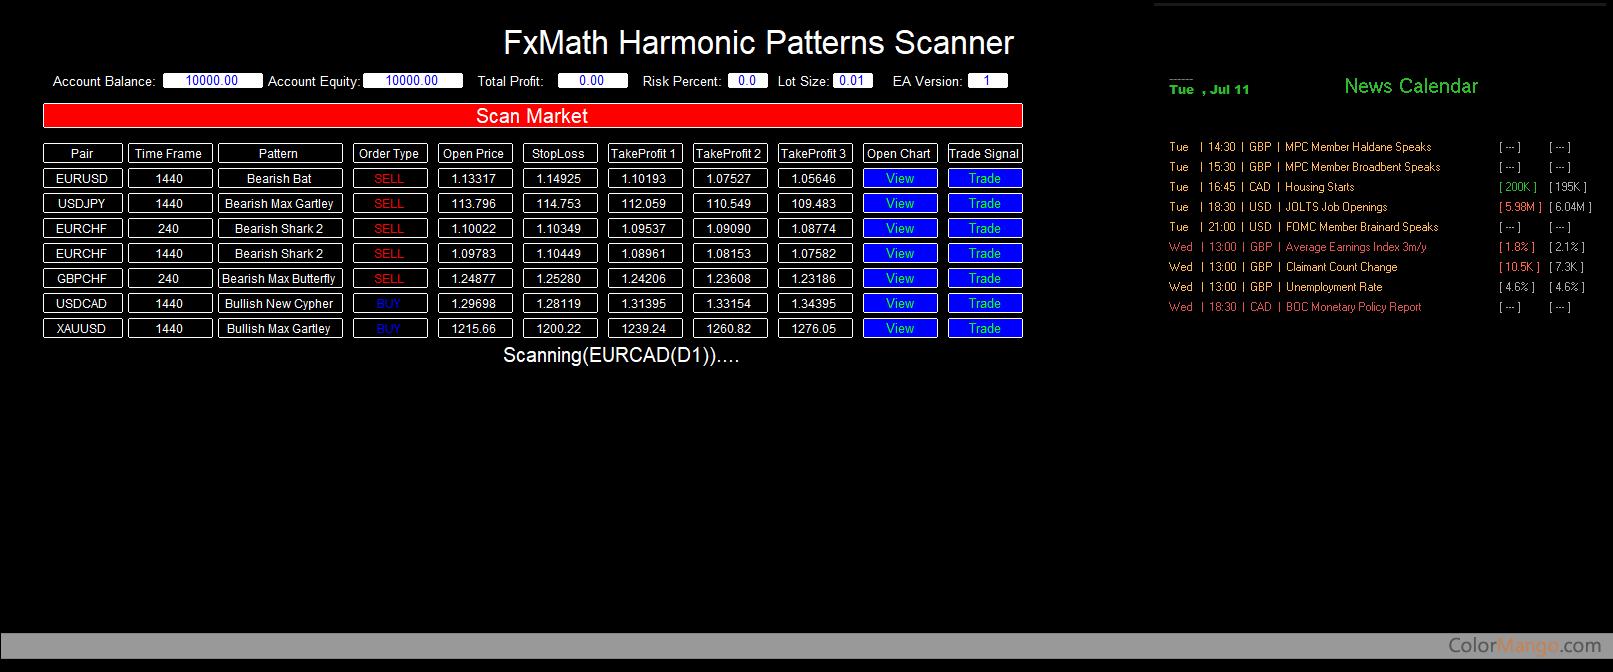 FxMath Harmonic Patterns Scanner Screenshot